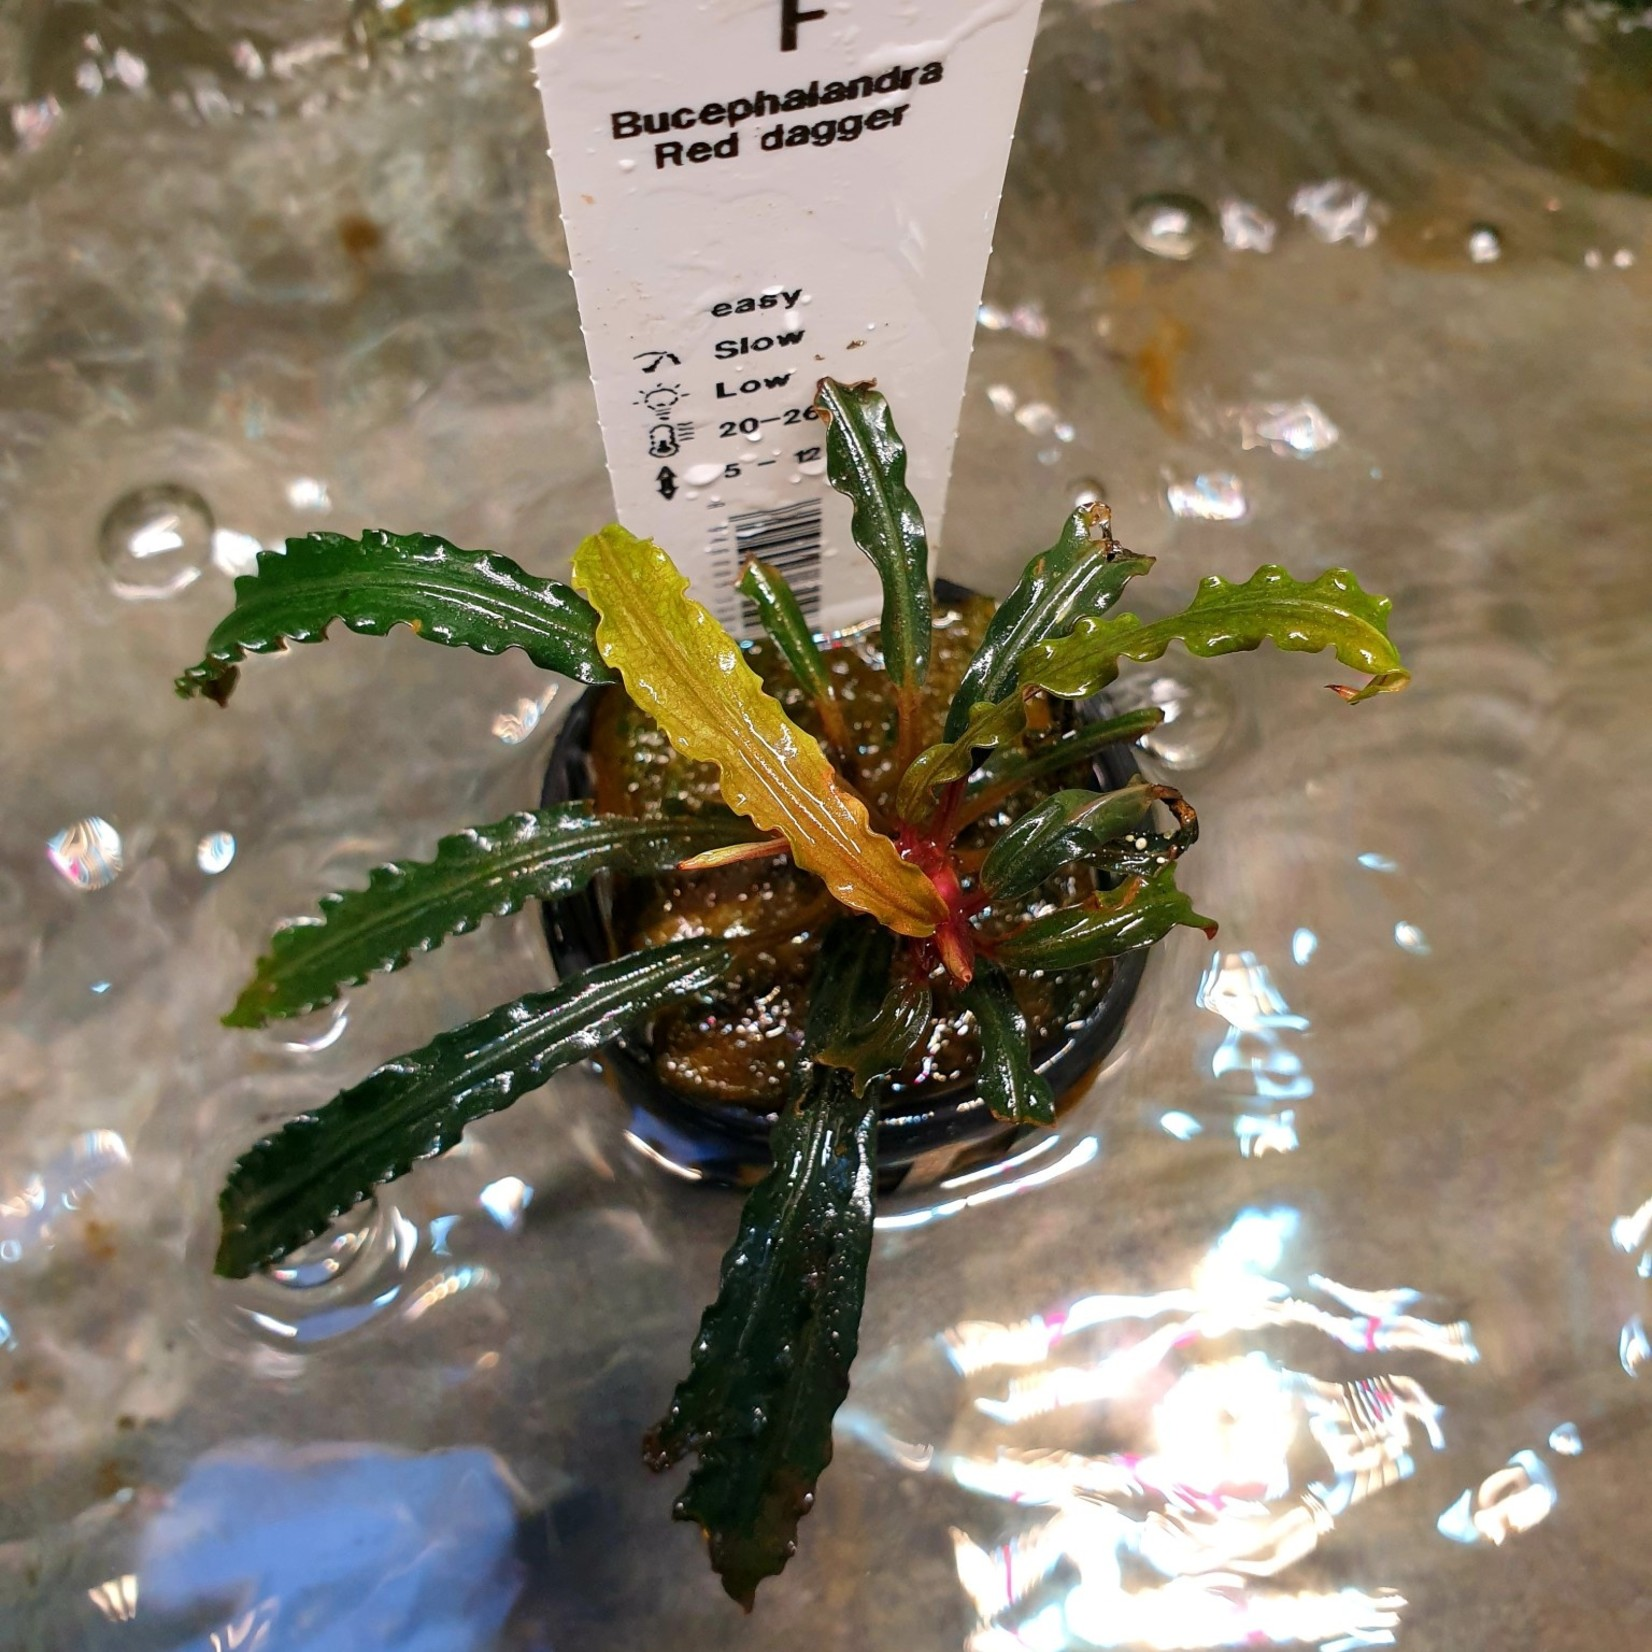 Bucephalandra Rode dolk